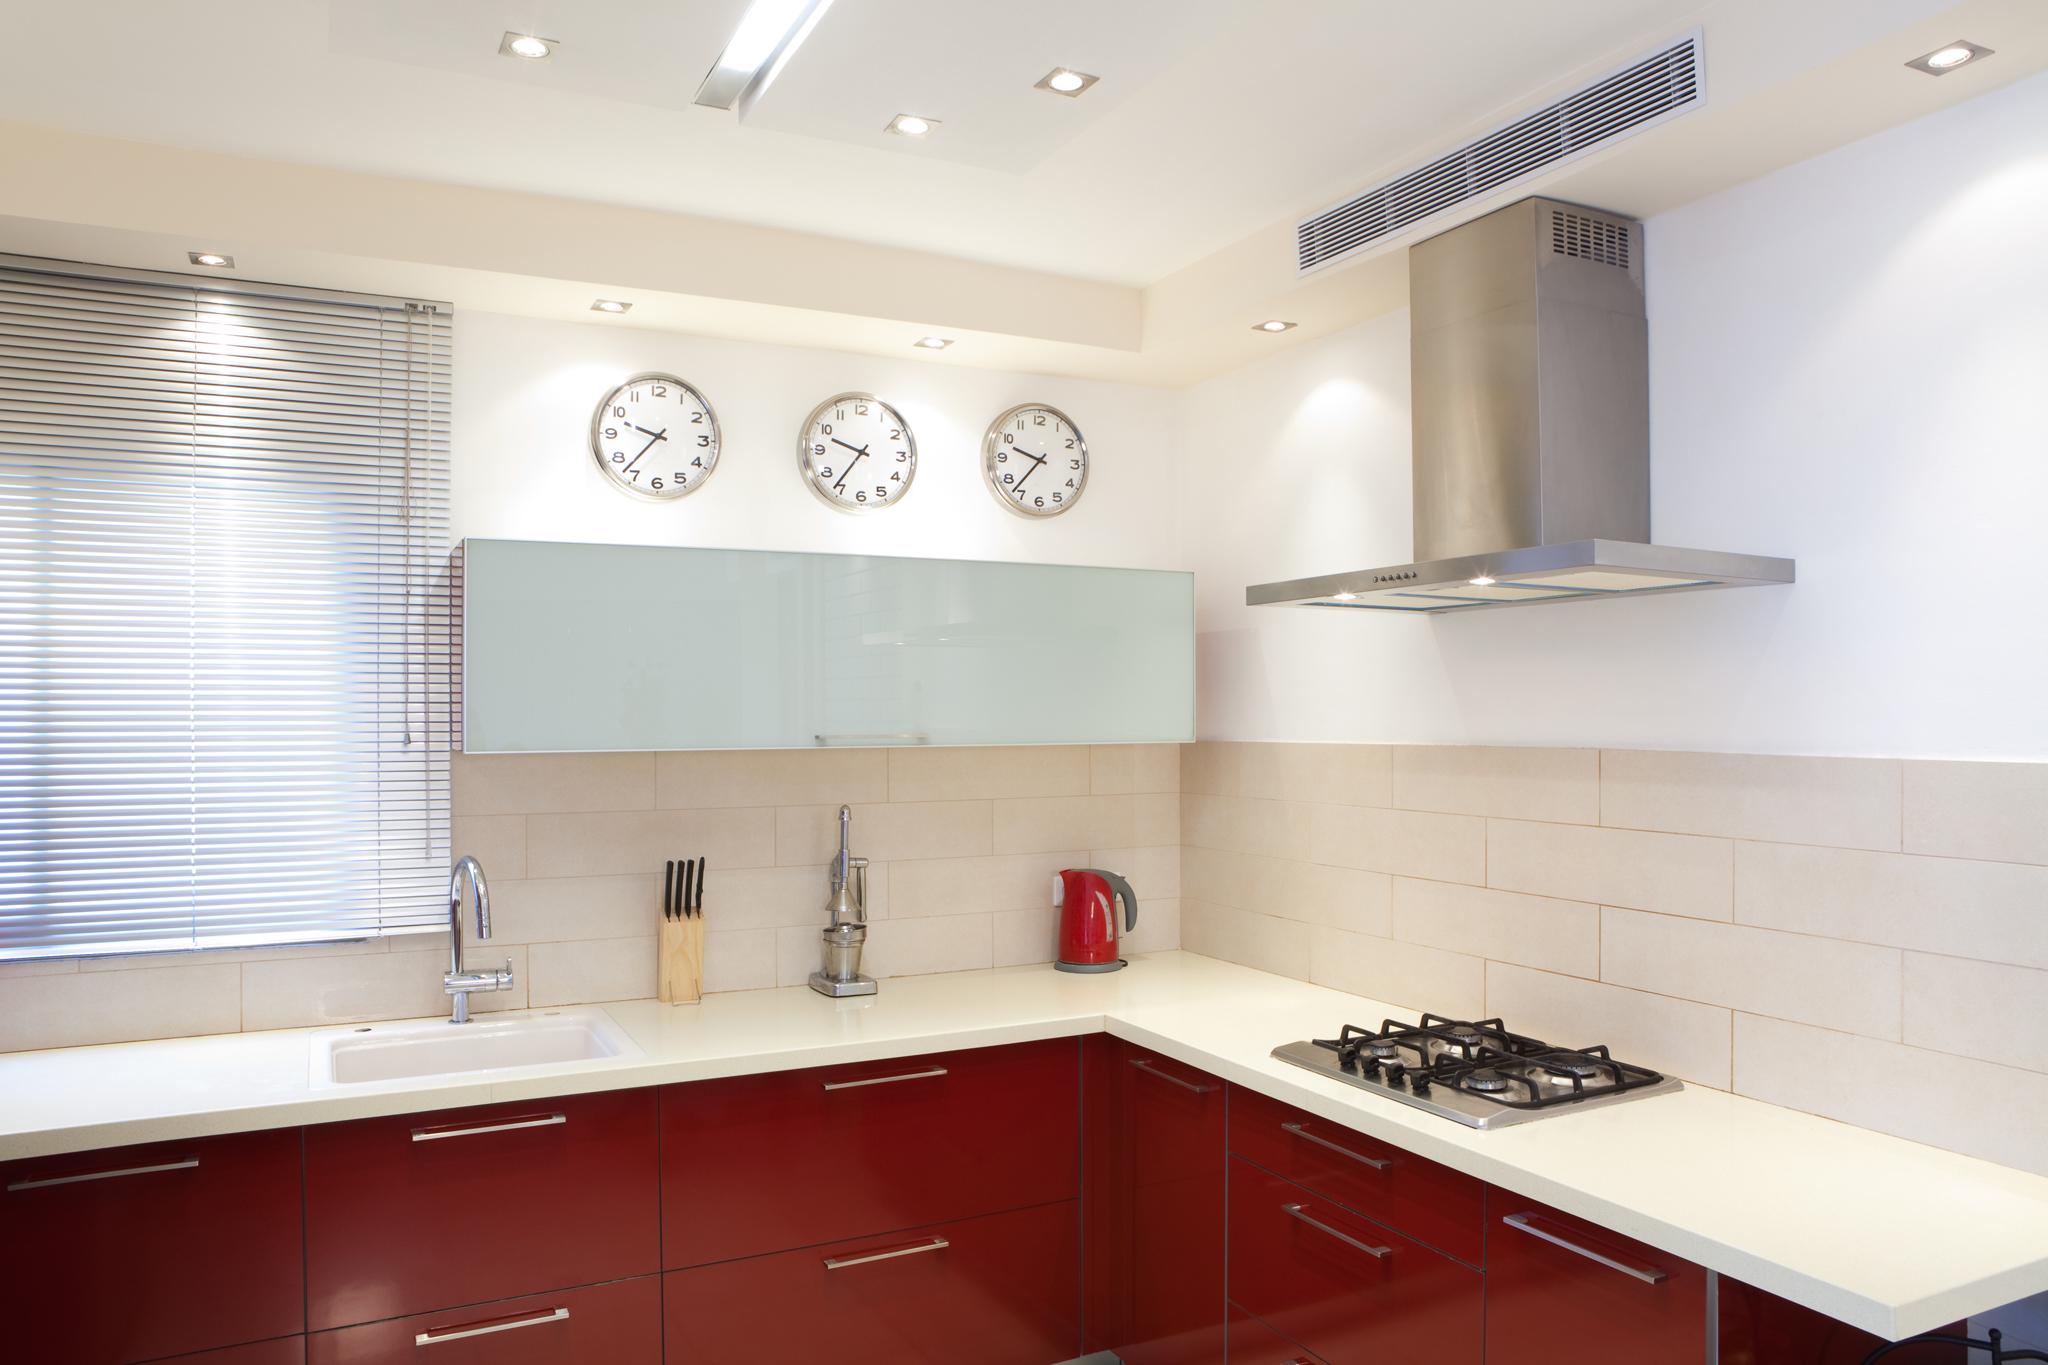 Bien choisir sa cuisine photos de conception de maison - Bien choisir sa hotte de cuisine ...